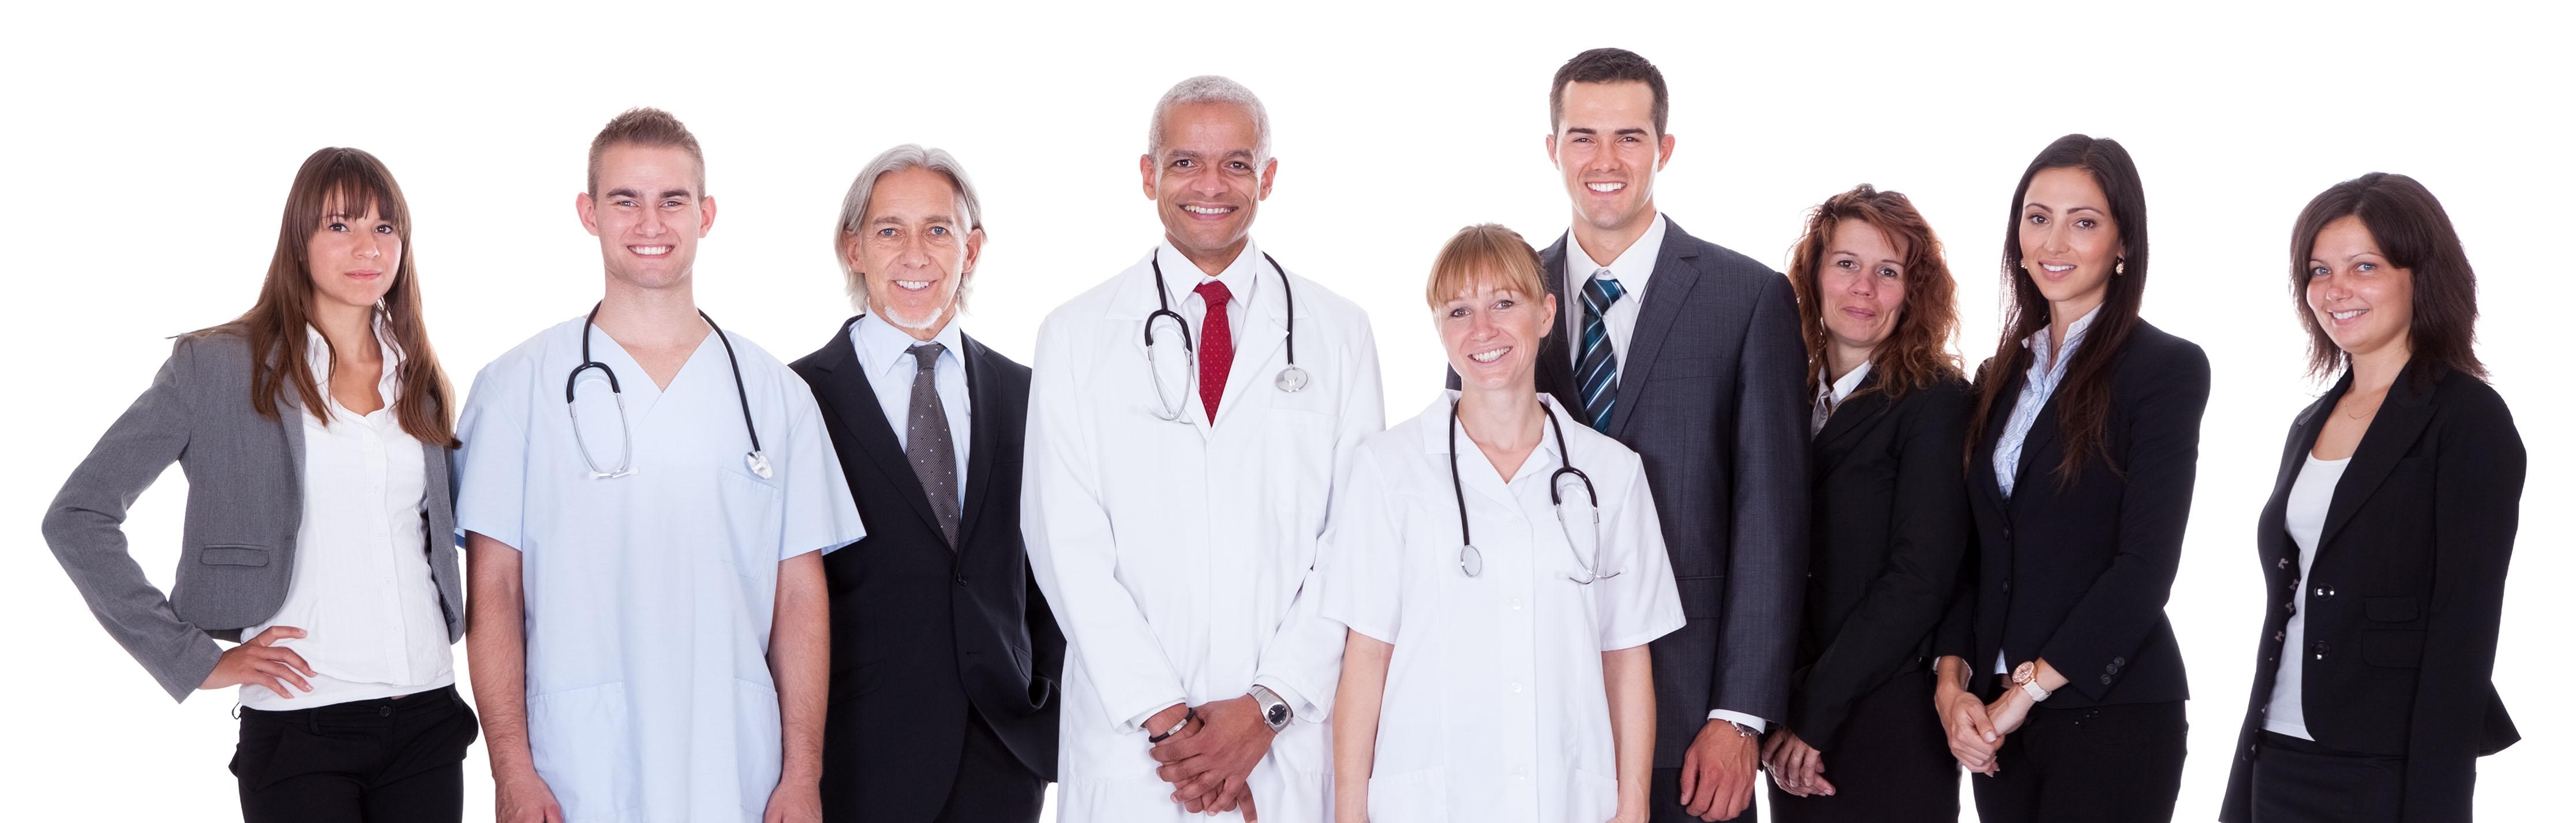 medical-staff2.jpg